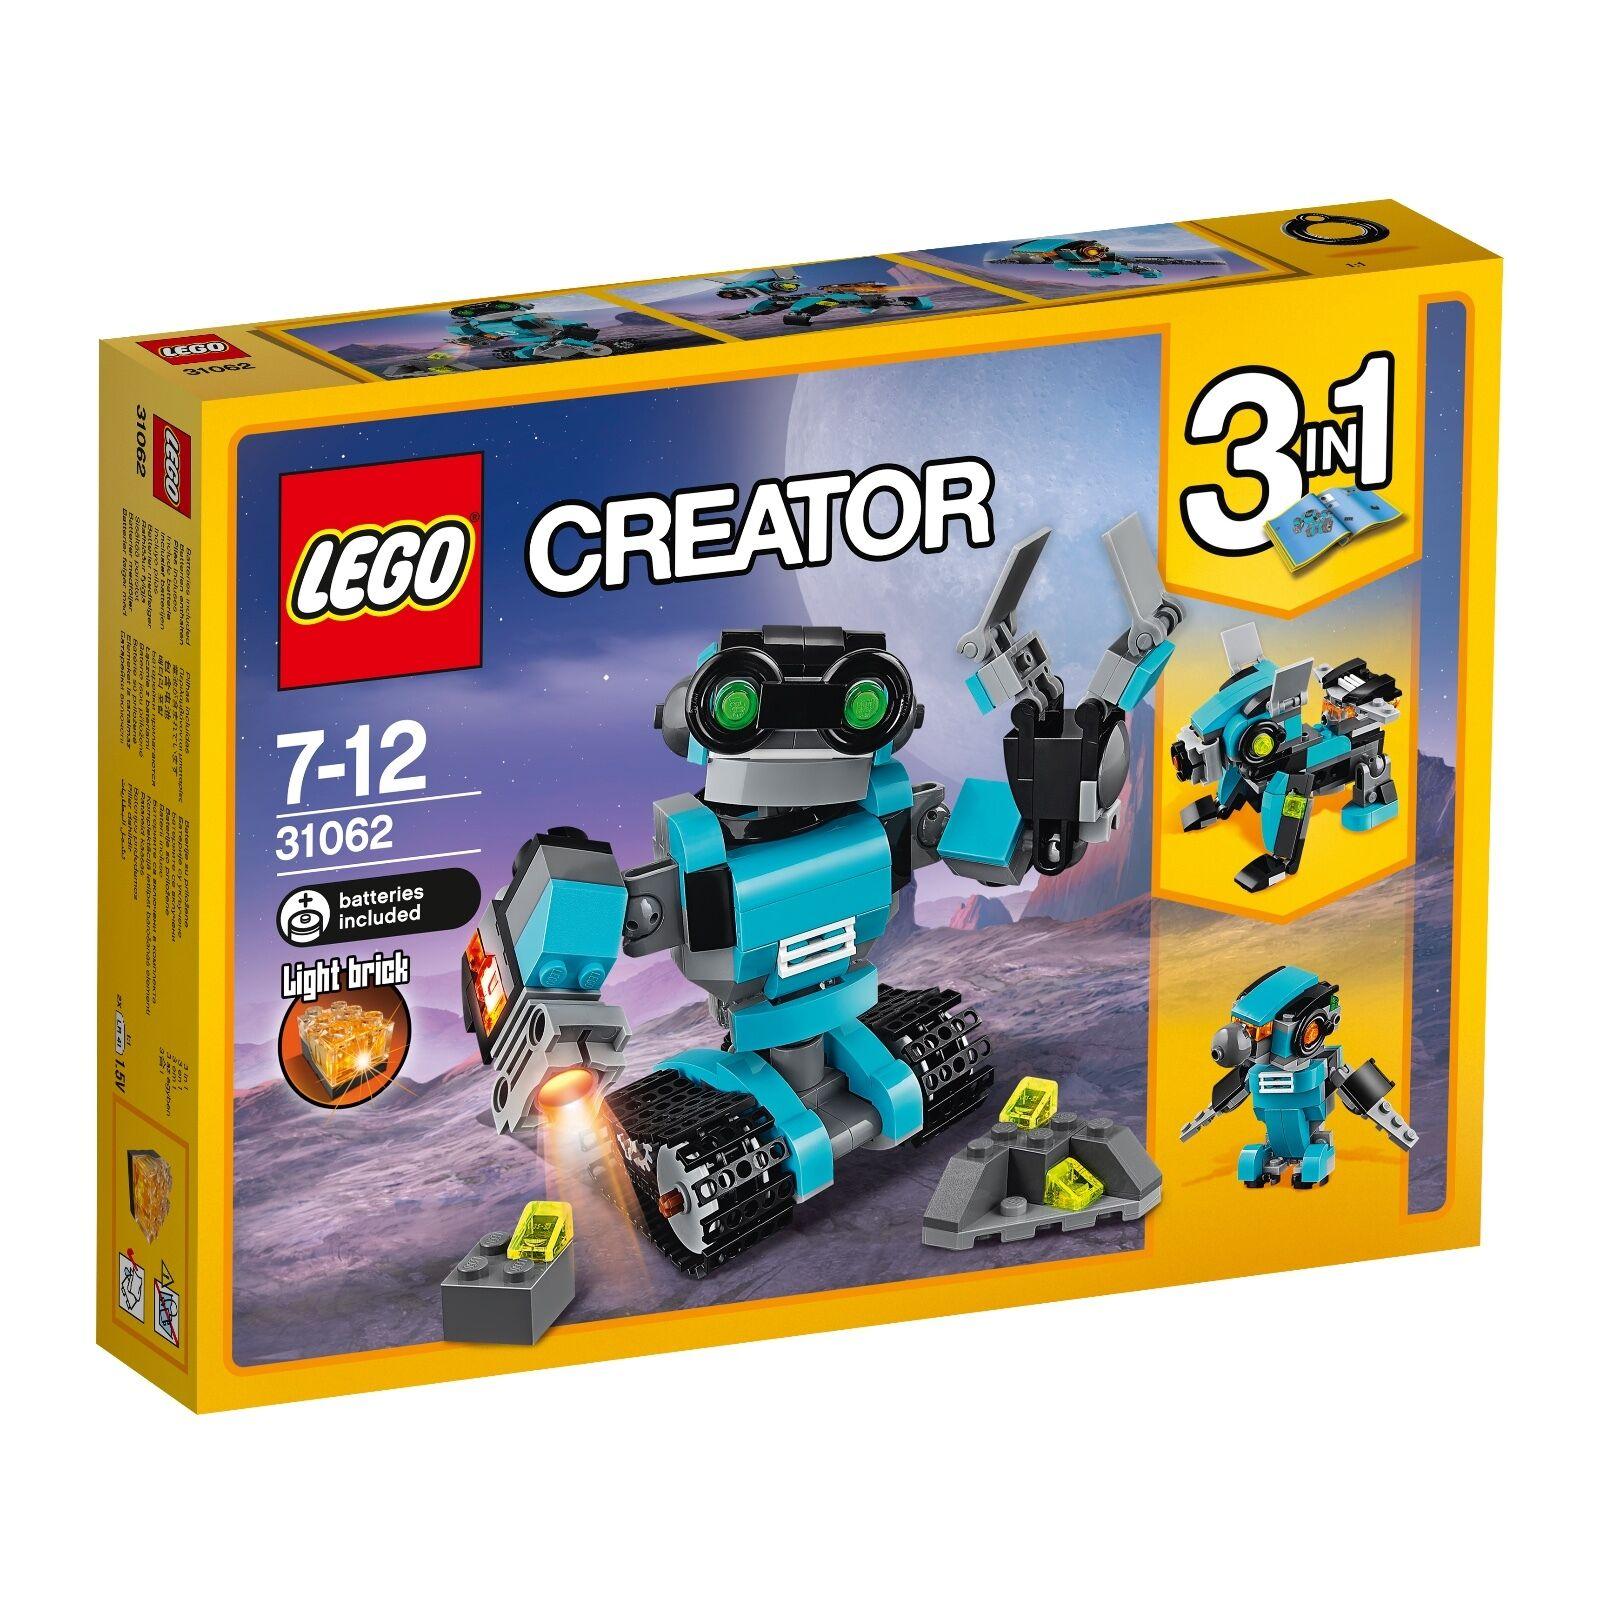 LEGO® Creator 31062 Forschungsroboter NEU OVP_ Robo Explorer NEW MISB NRFB